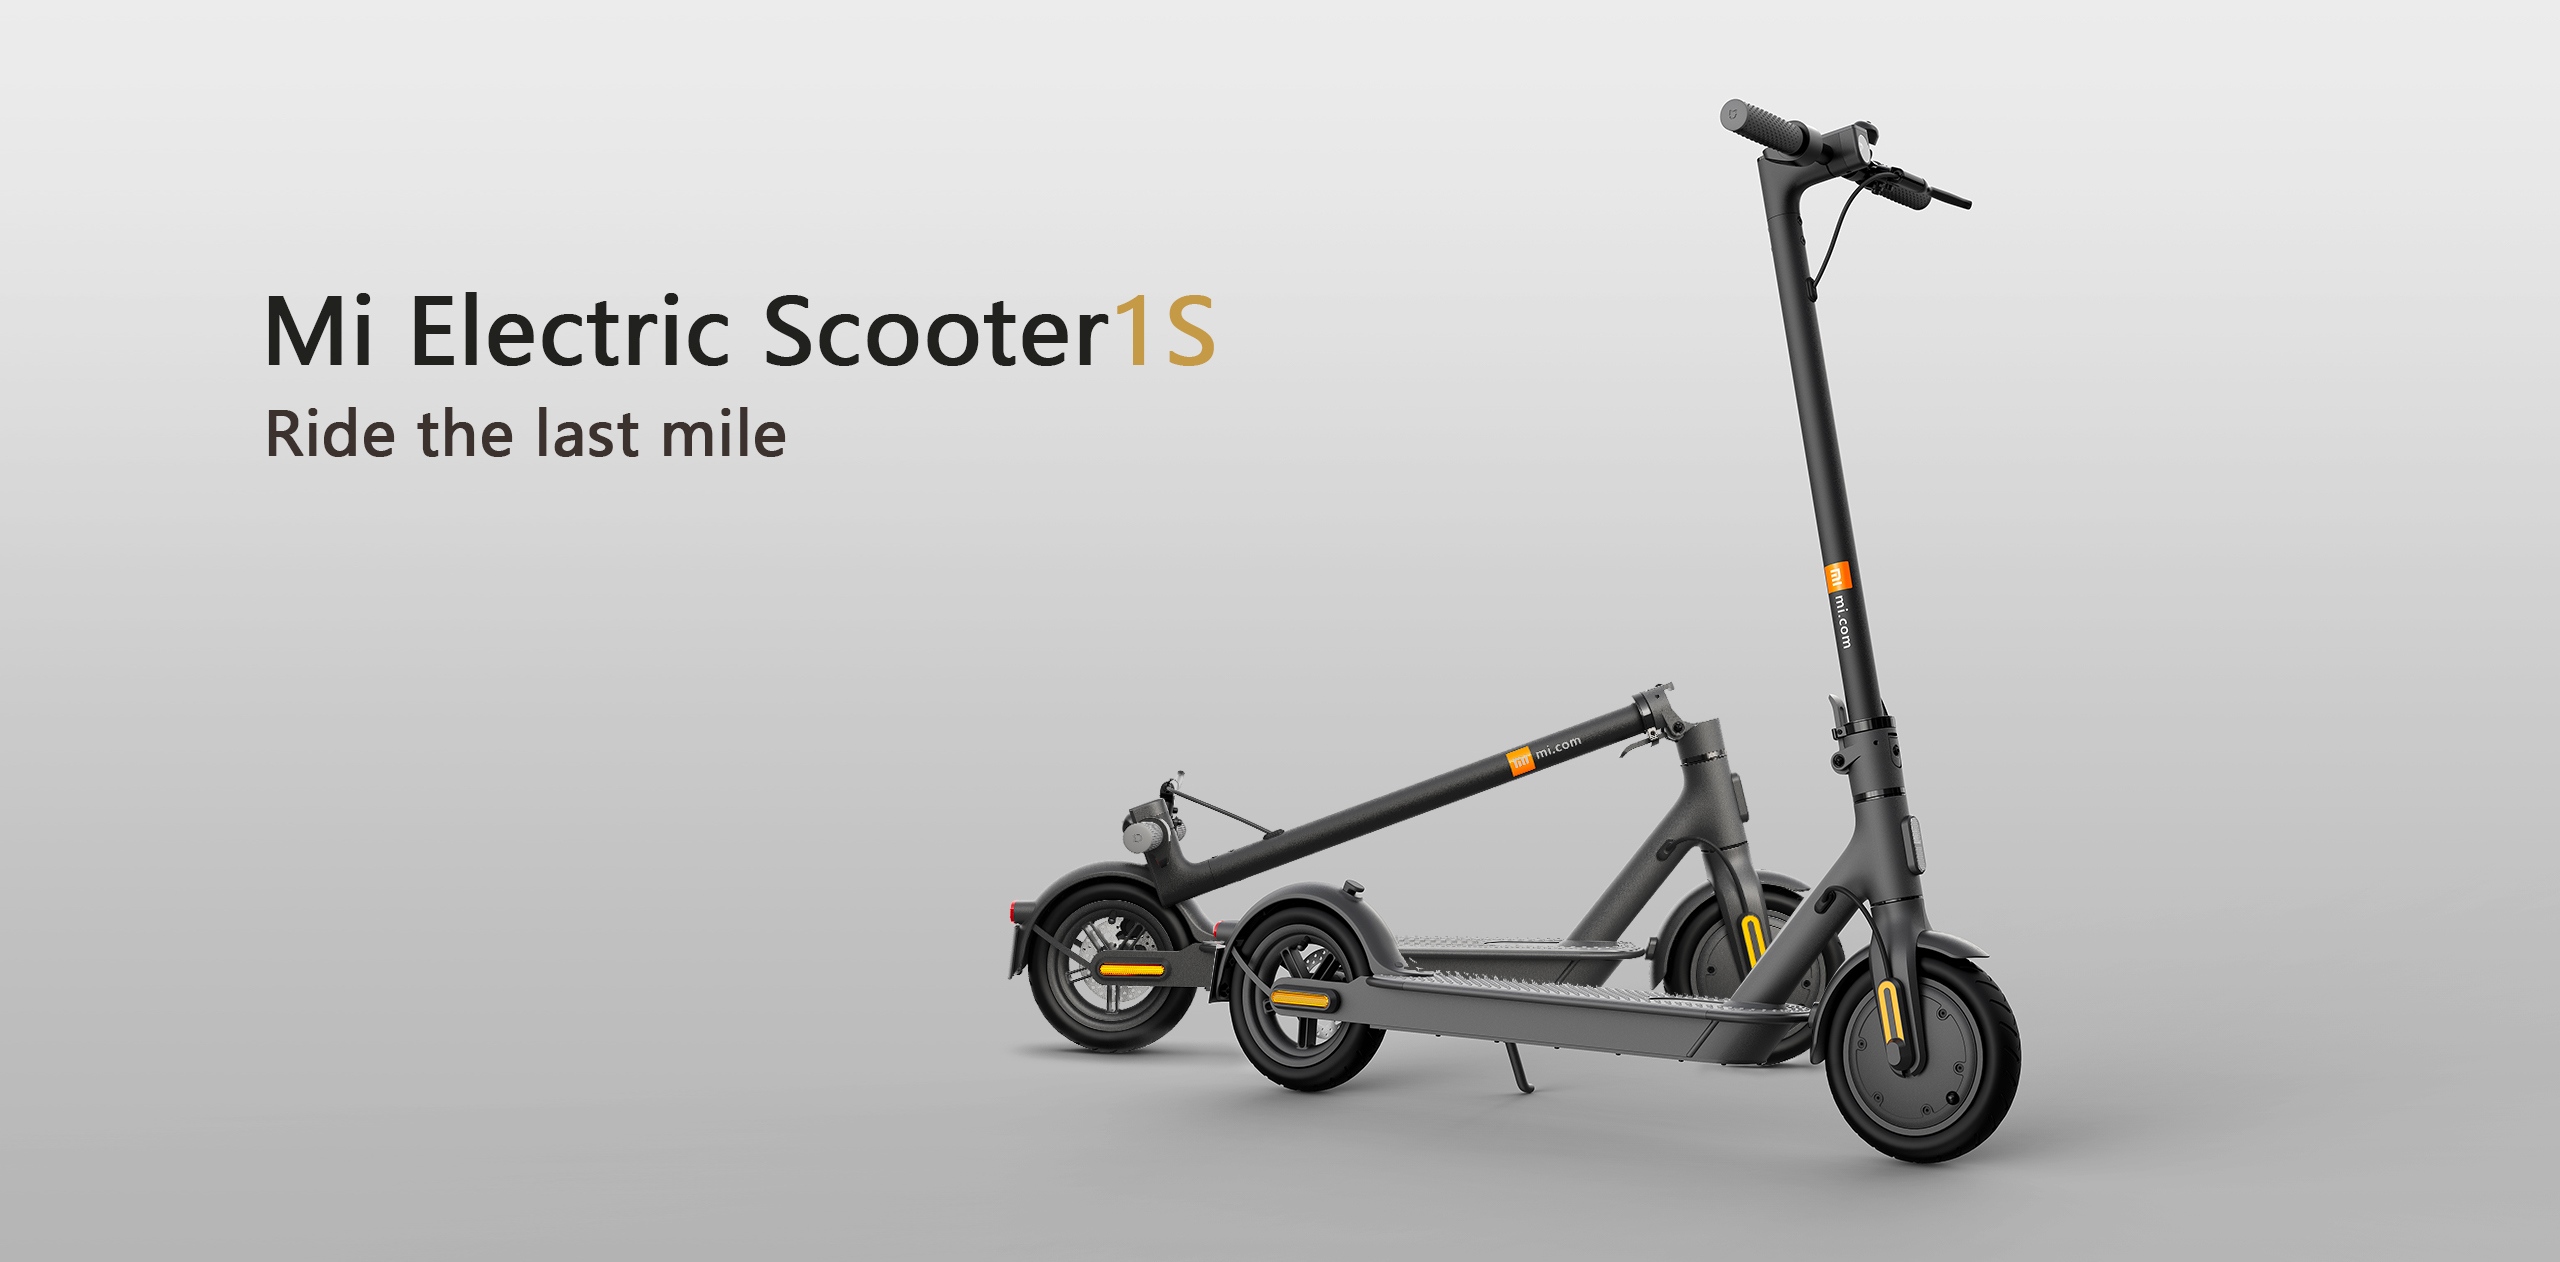 XIAOMI MI Electric S1 Mijia Original Mija Essential Pro 2 M365 Patinete Electrico E-scooter Xiaomi Scooter 1s